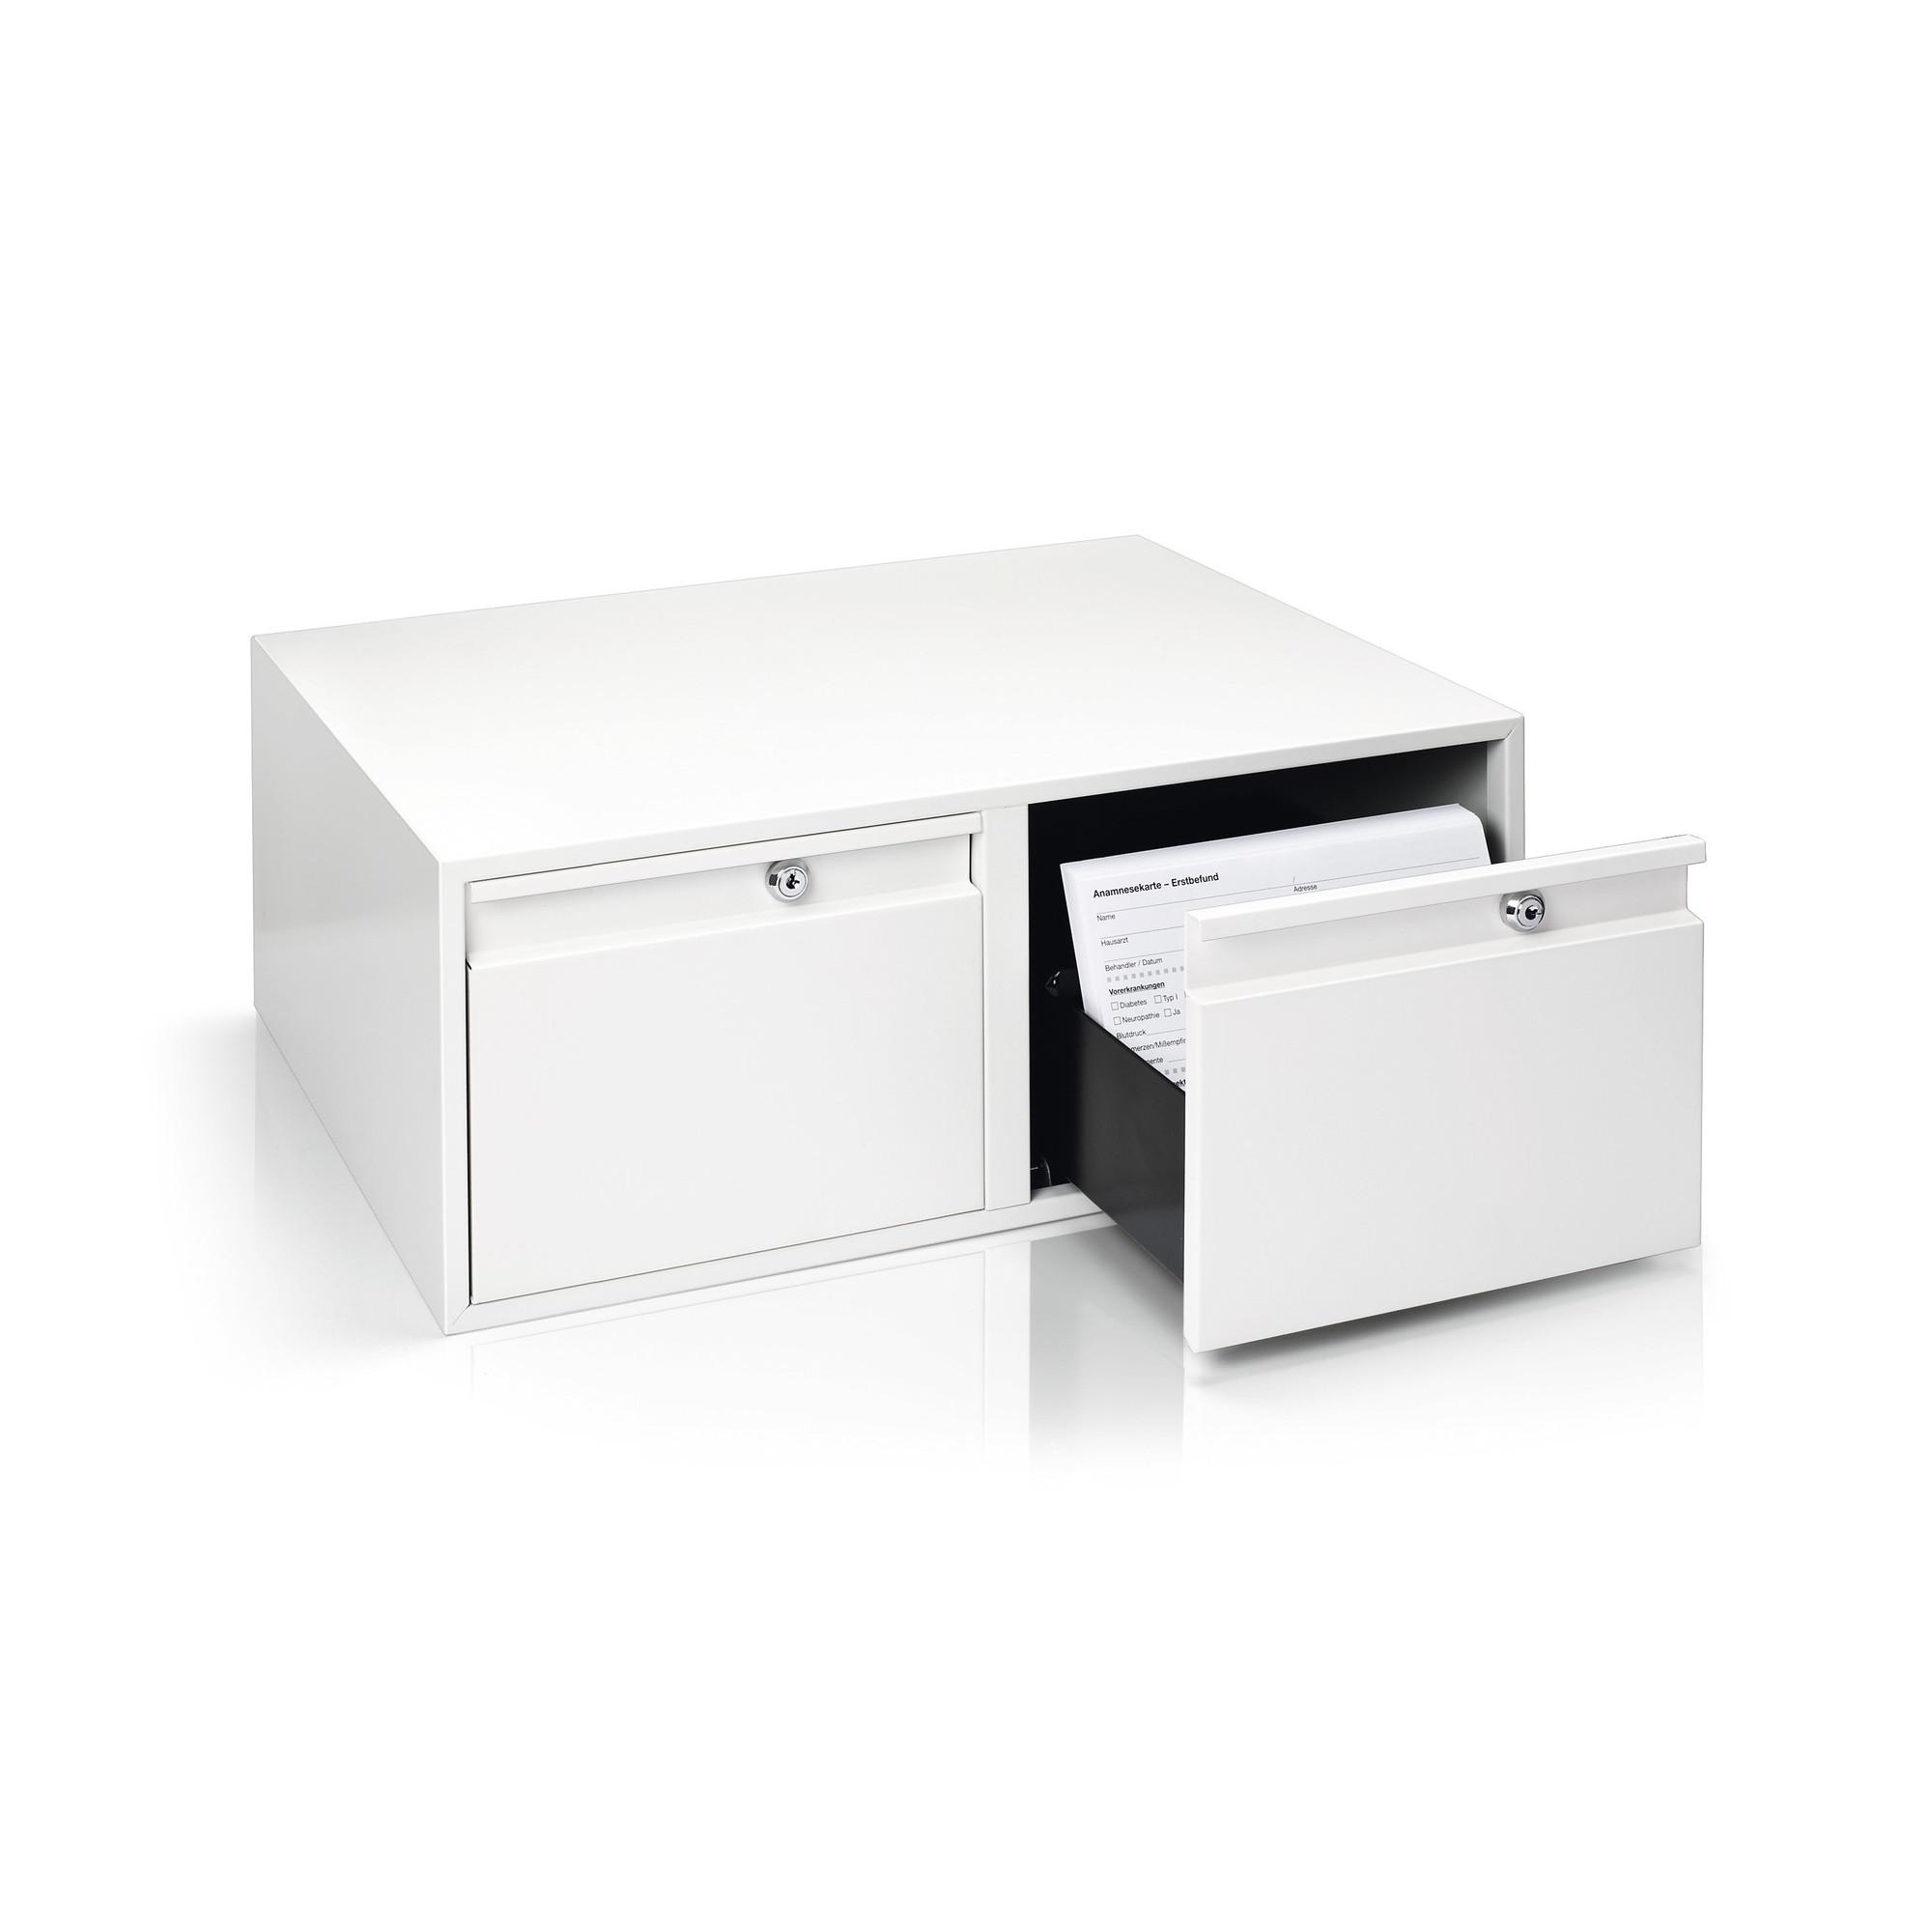 caisse de rangement acier blanc pur ruck my podologie. Black Bedroom Furniture Sets. Home Design Ideas